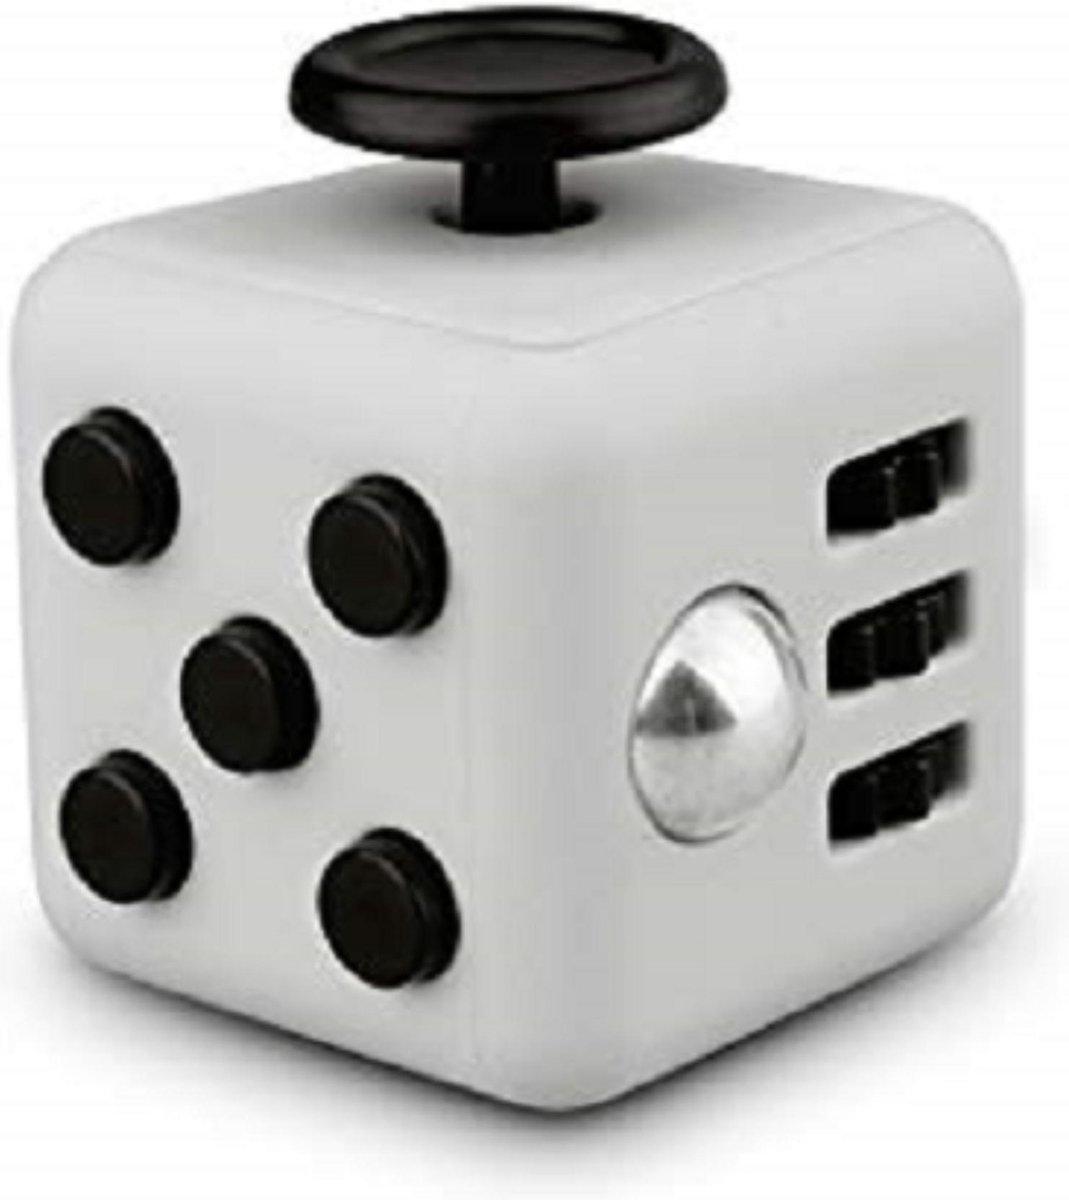 Tokomundo Fidget Cube - Anti Stress Speelgoed - Stressbal - Stressbal voor Hand - Friemelkubus - Fidget - Zwart